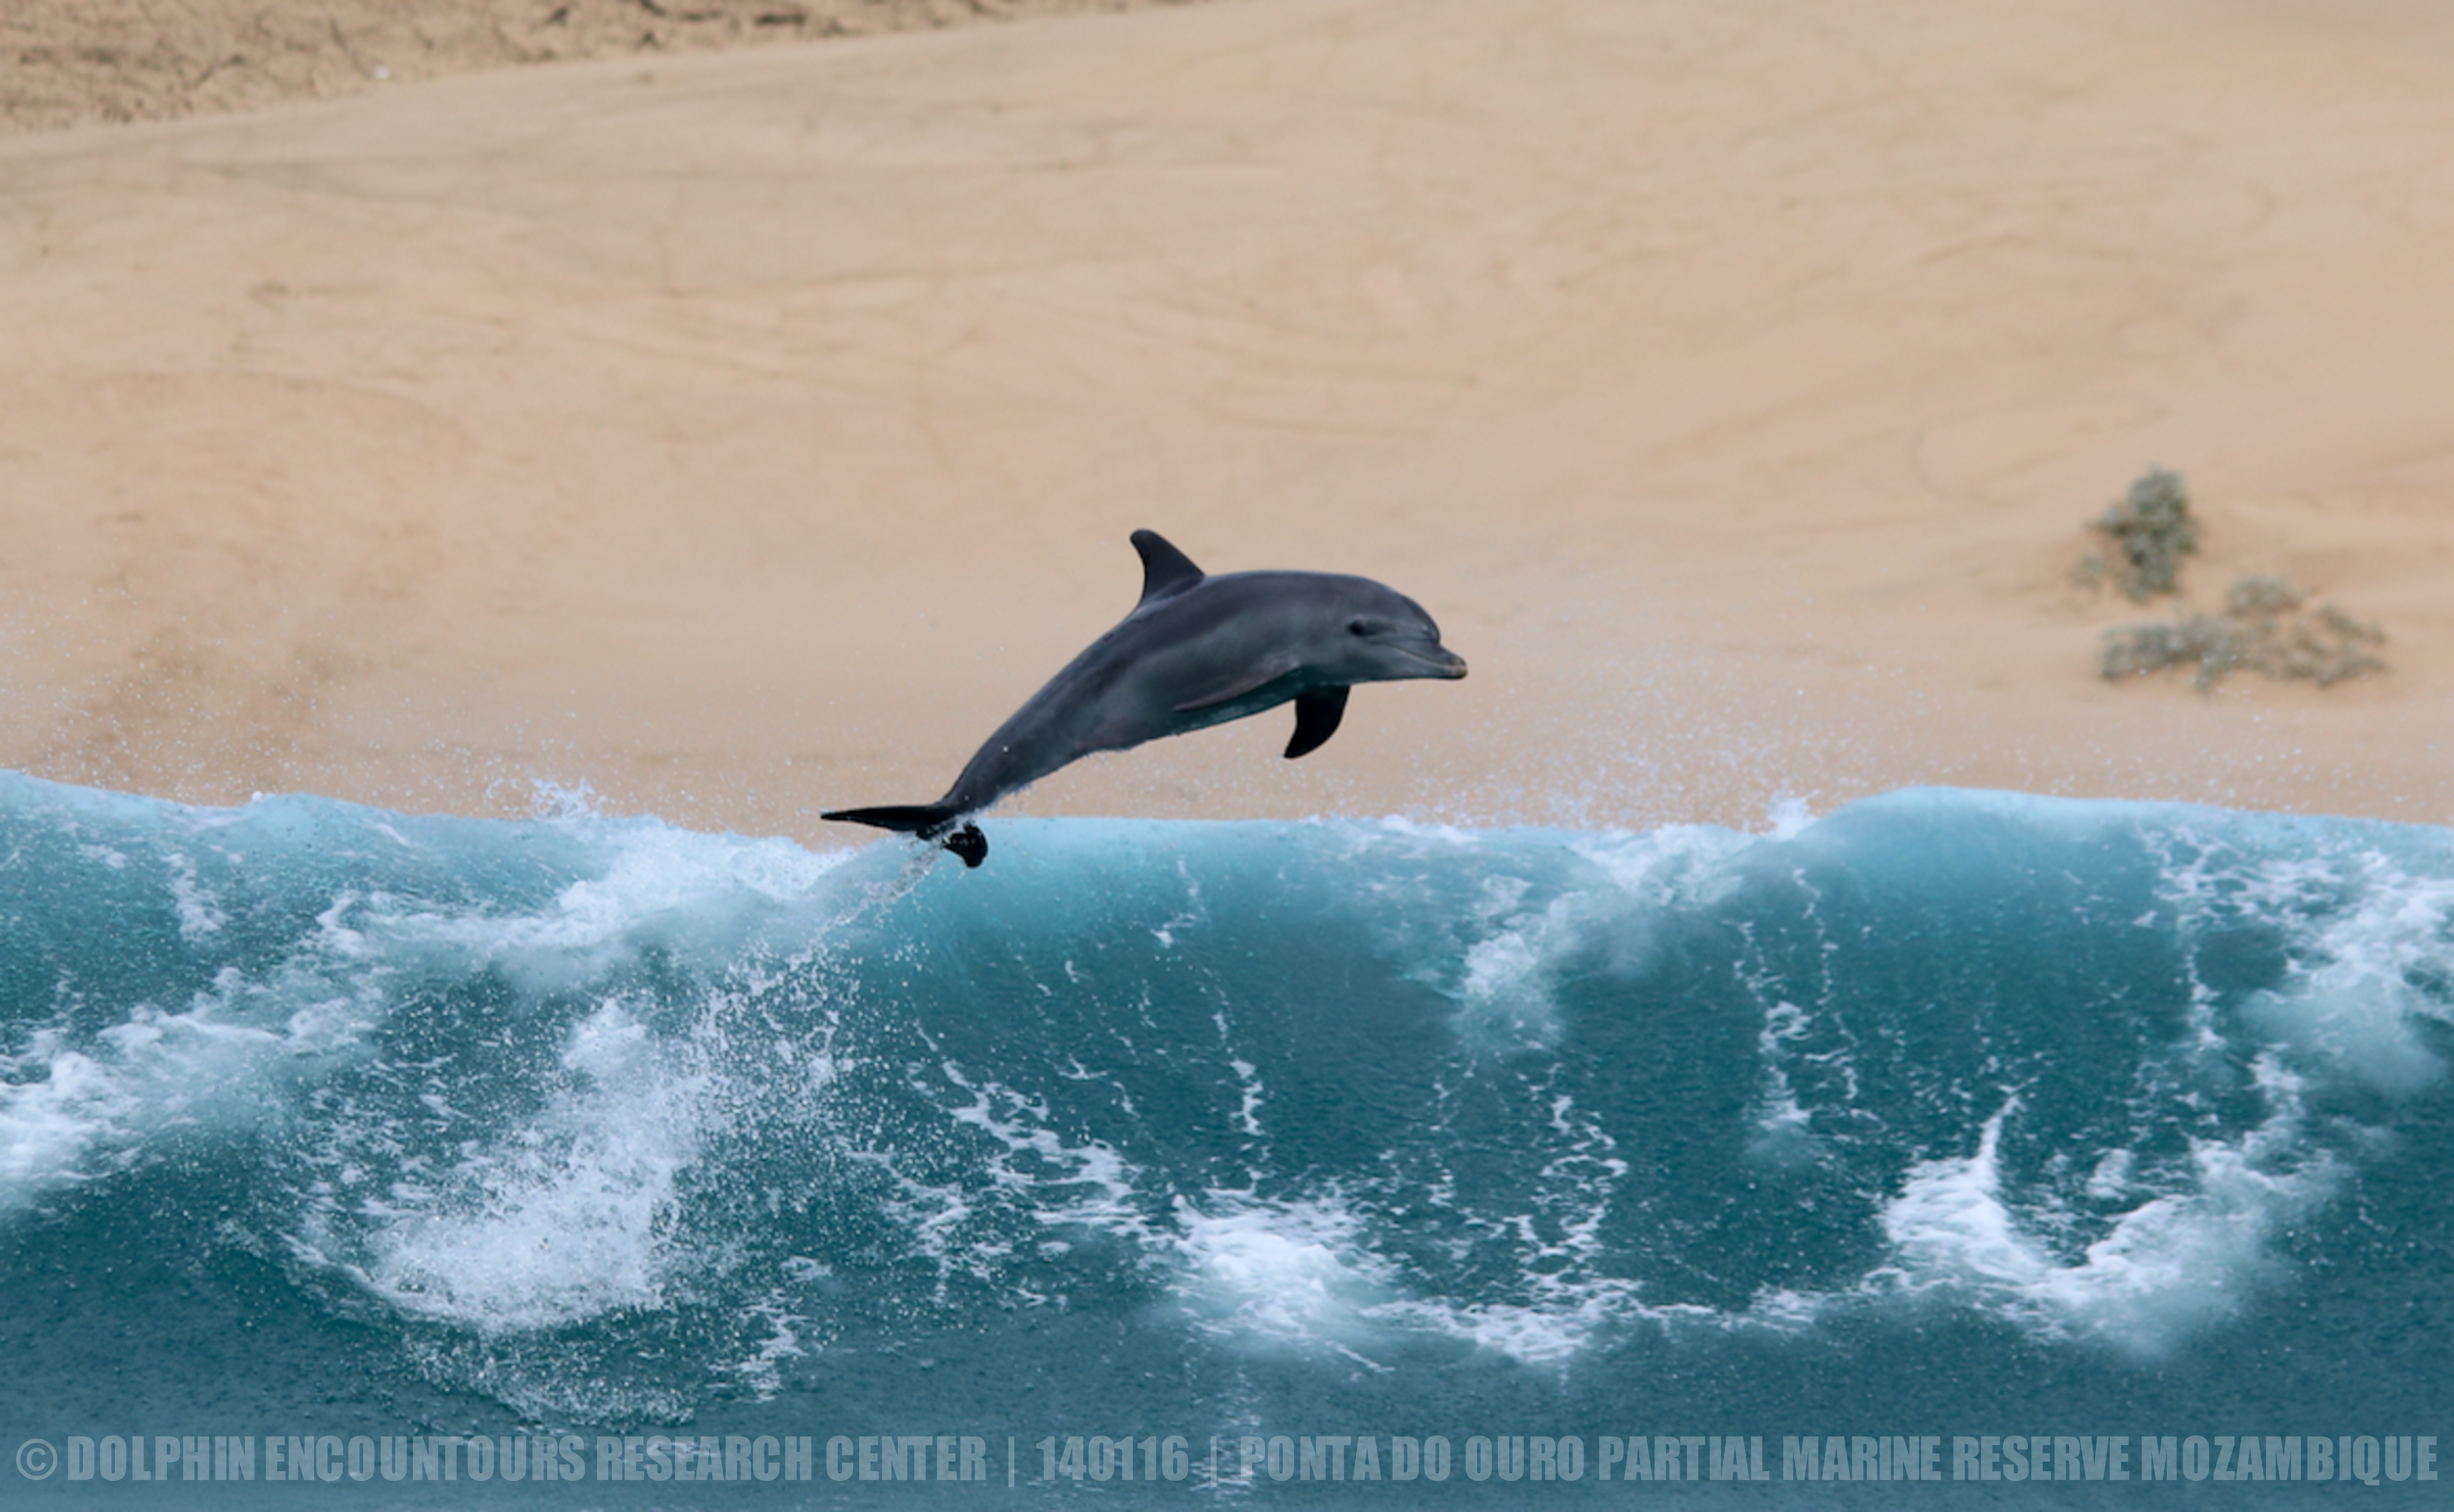 Protecting habitats